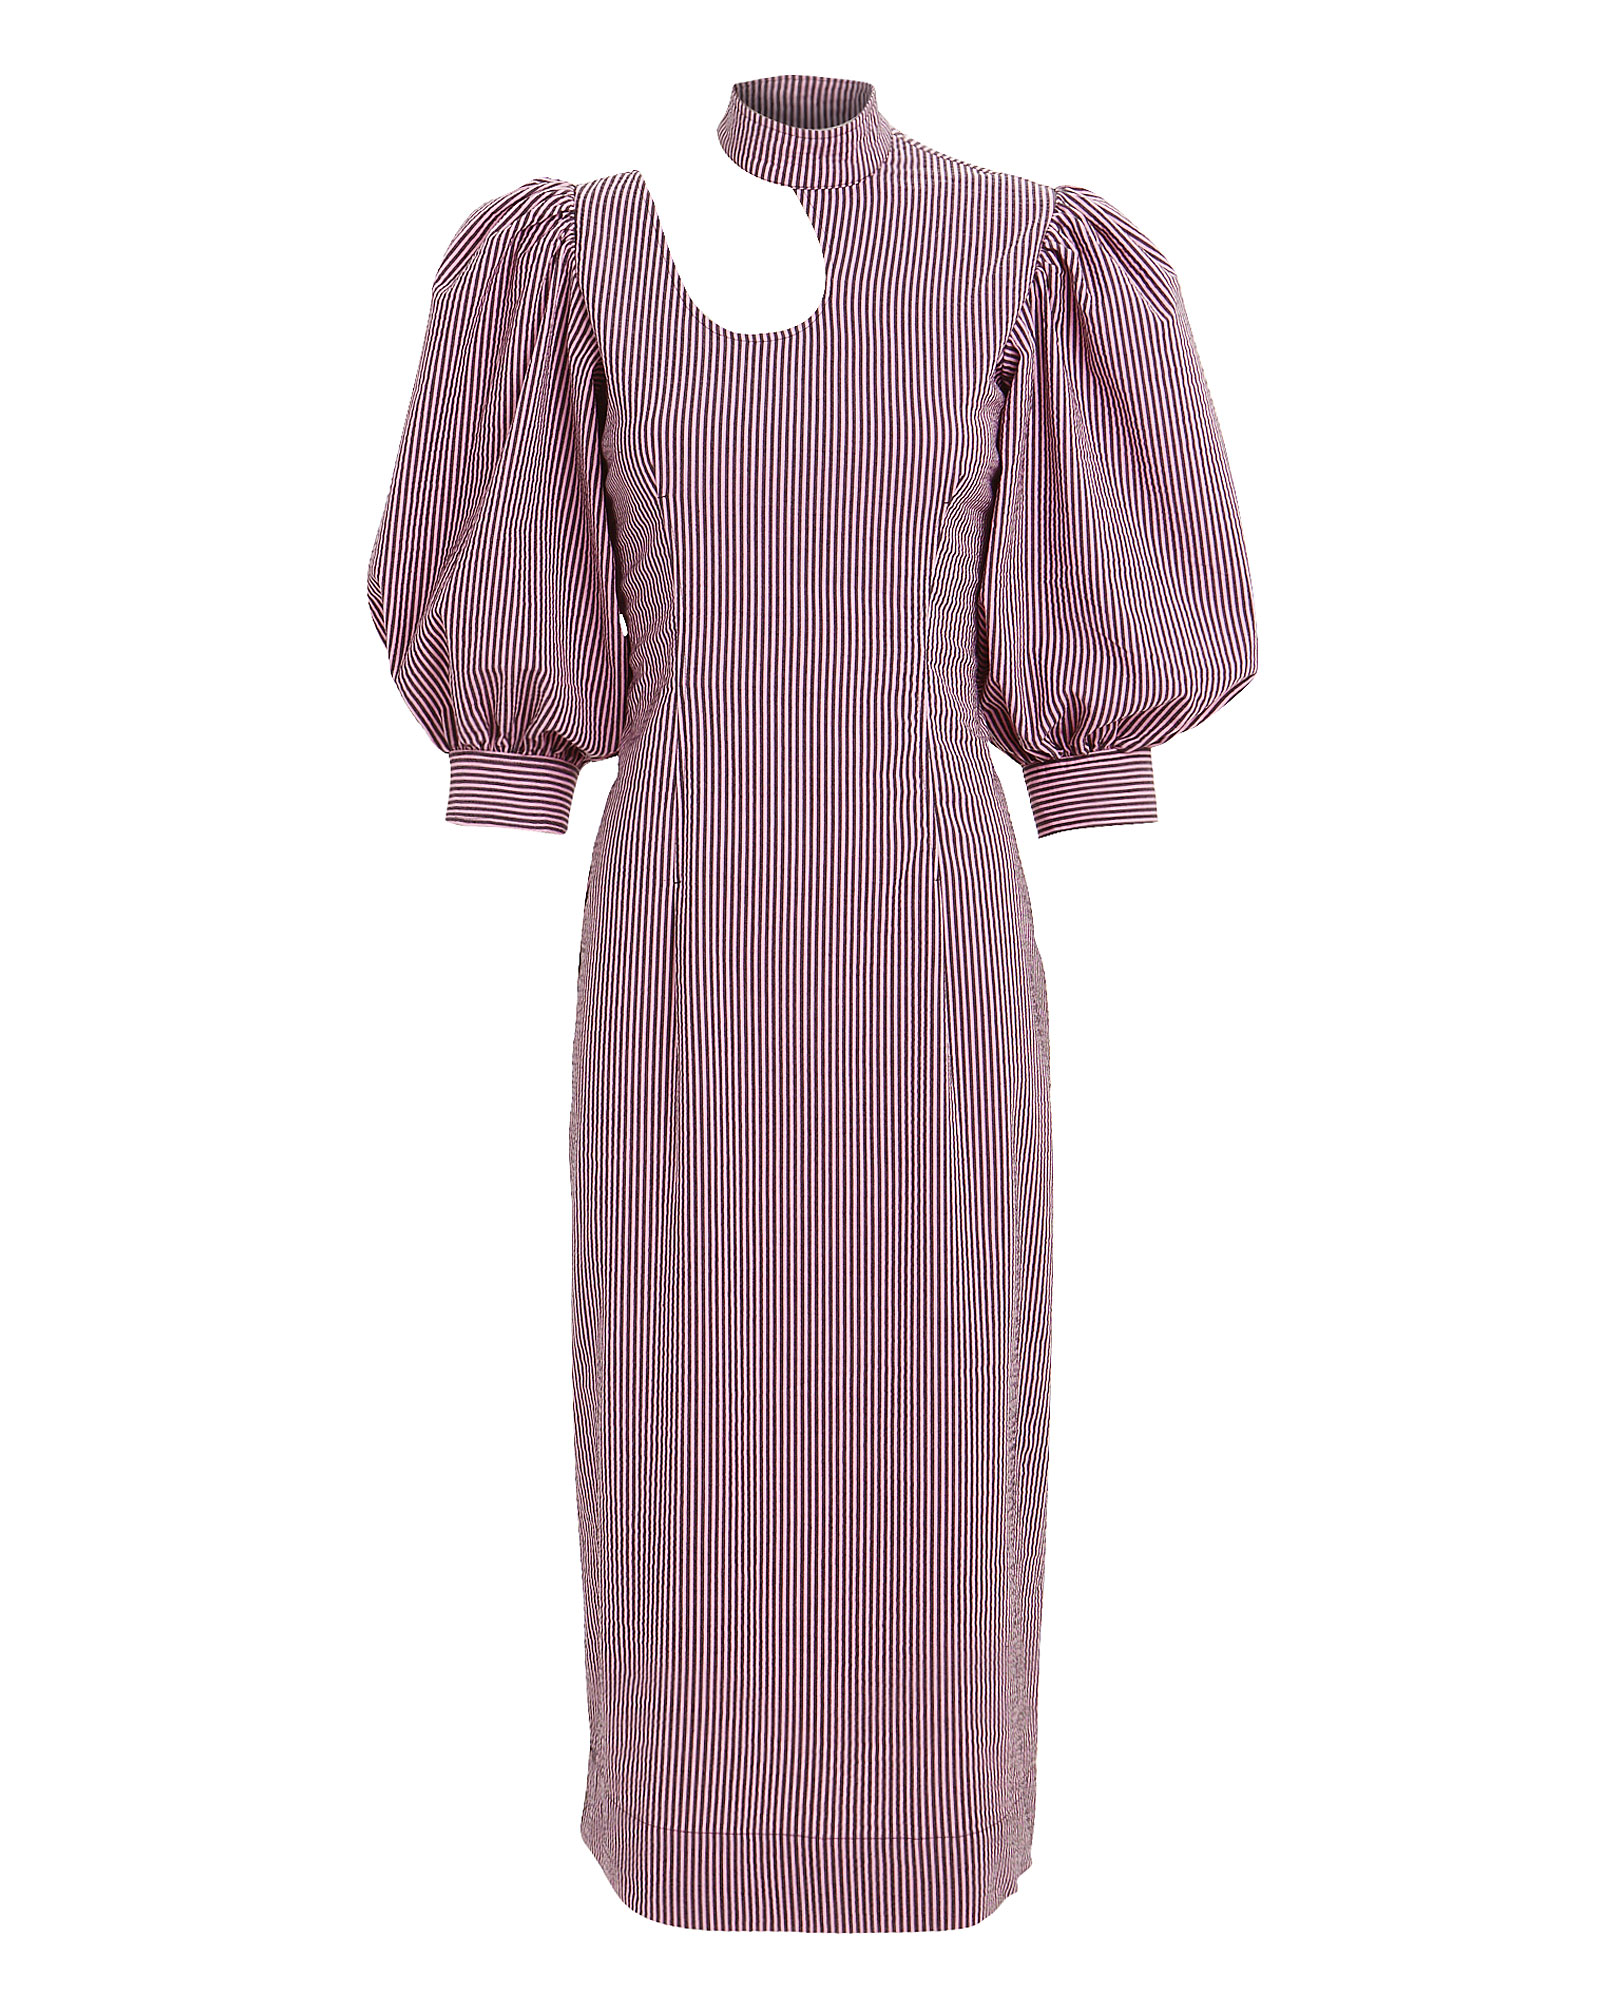 Ganni Dresses GANNI SEERSUCKER PINSTRIPE CUTOUT COLLAR DRESS  PINK 36